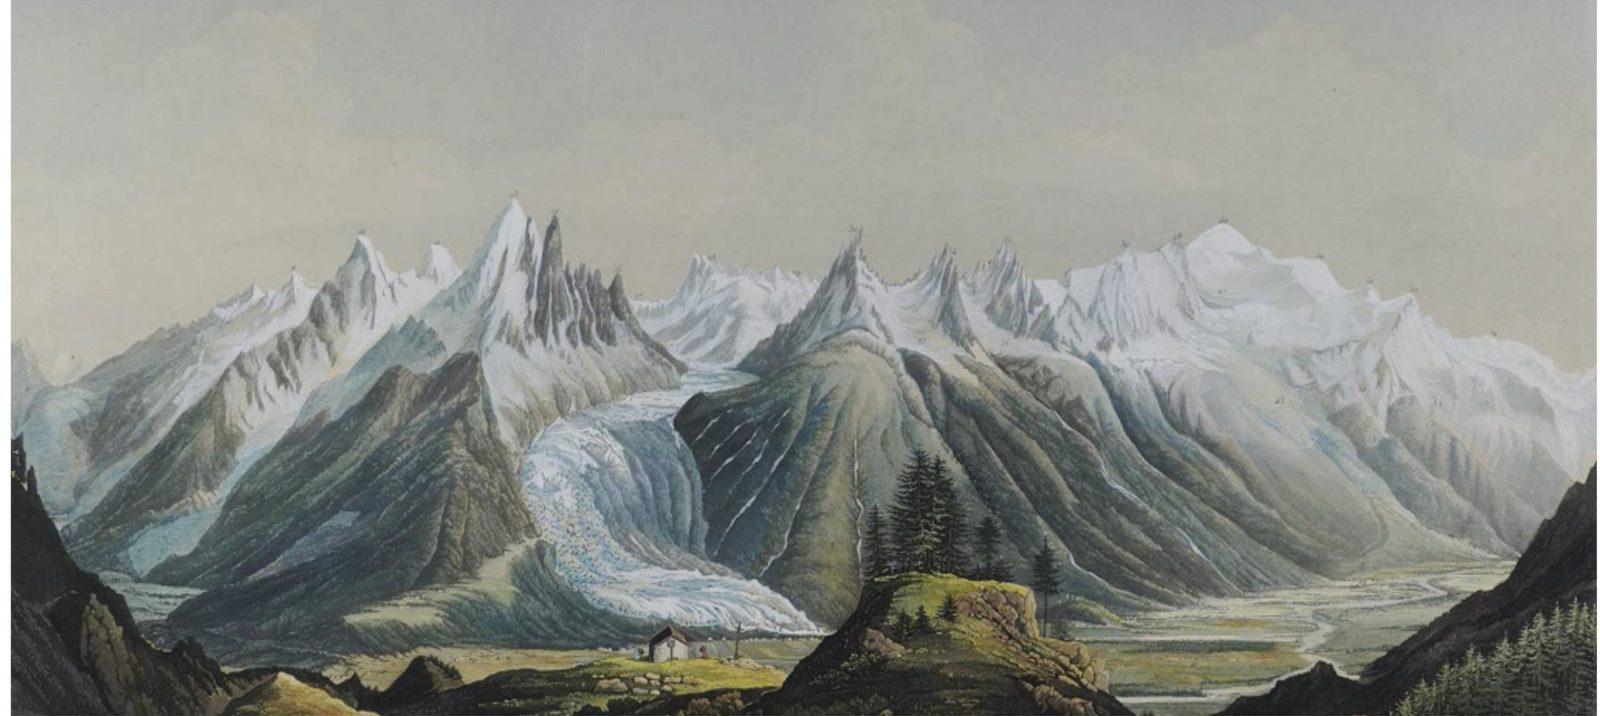 Les Alpes dessin en ligne ligne Chamonix et Turin